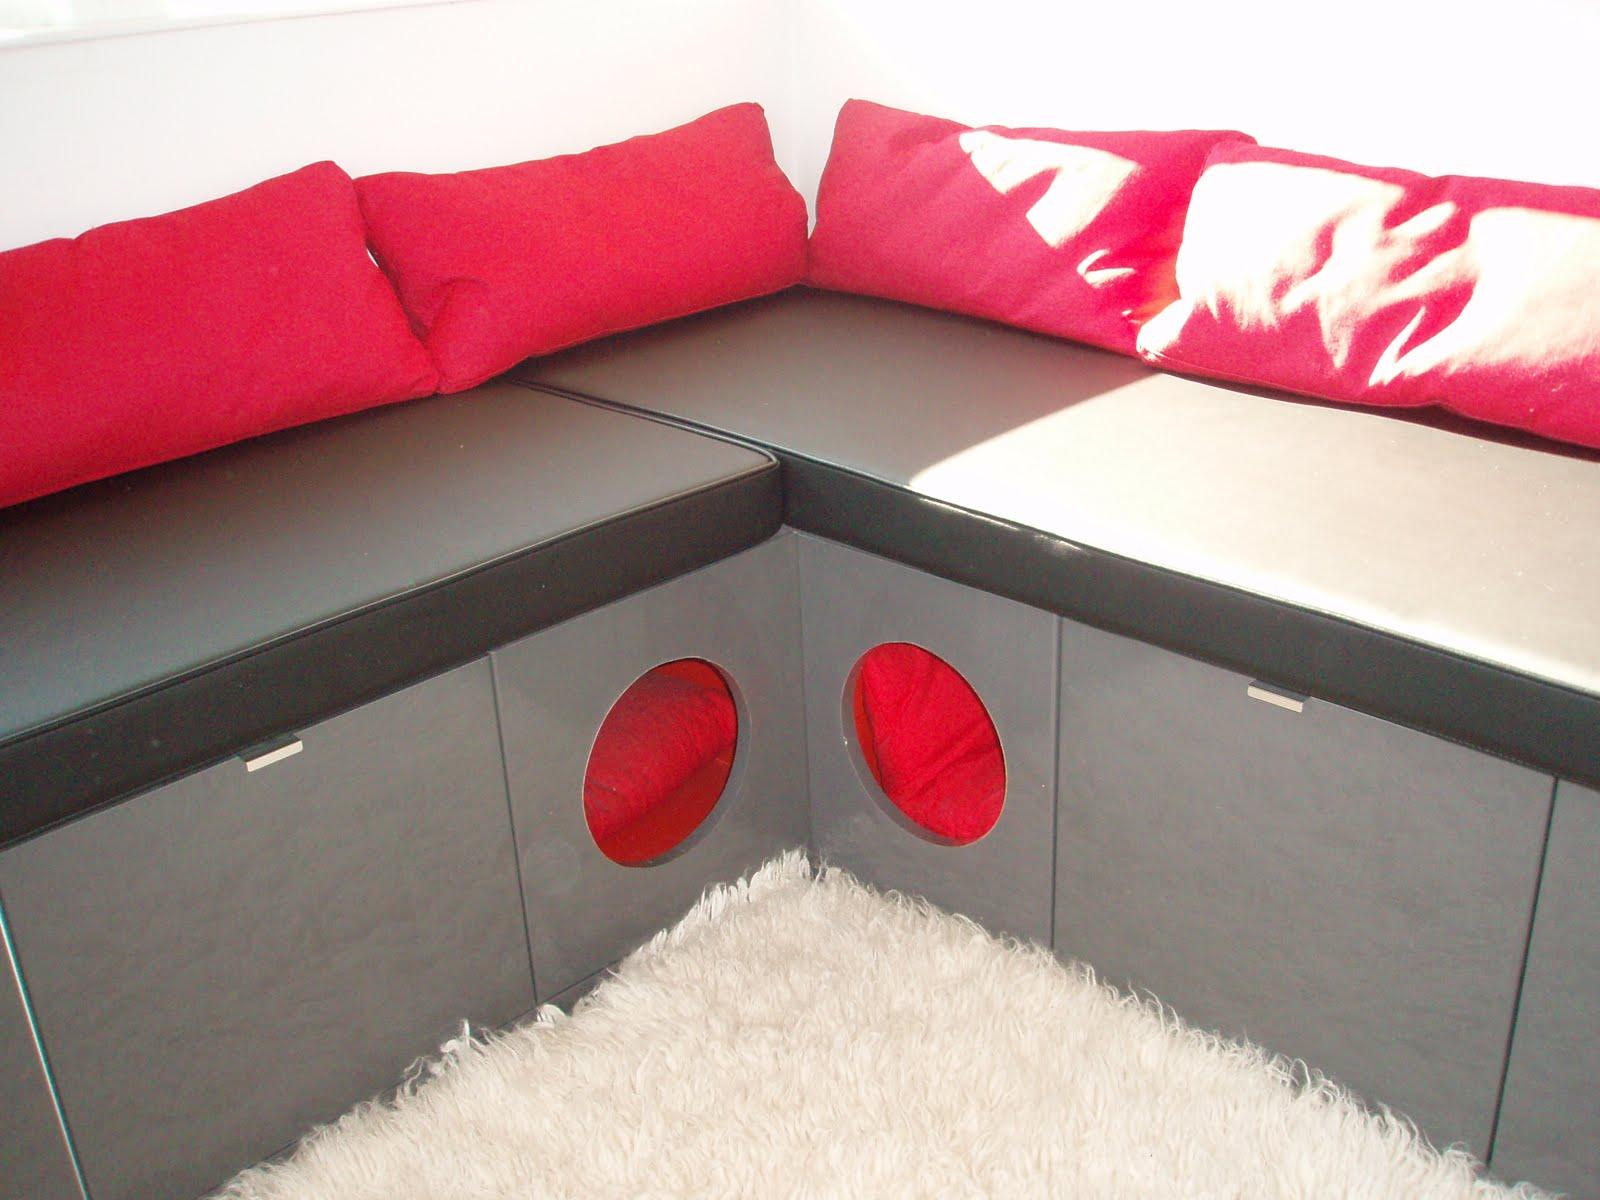 Traagschuim Kussen Ikea : Baby kussen ikea